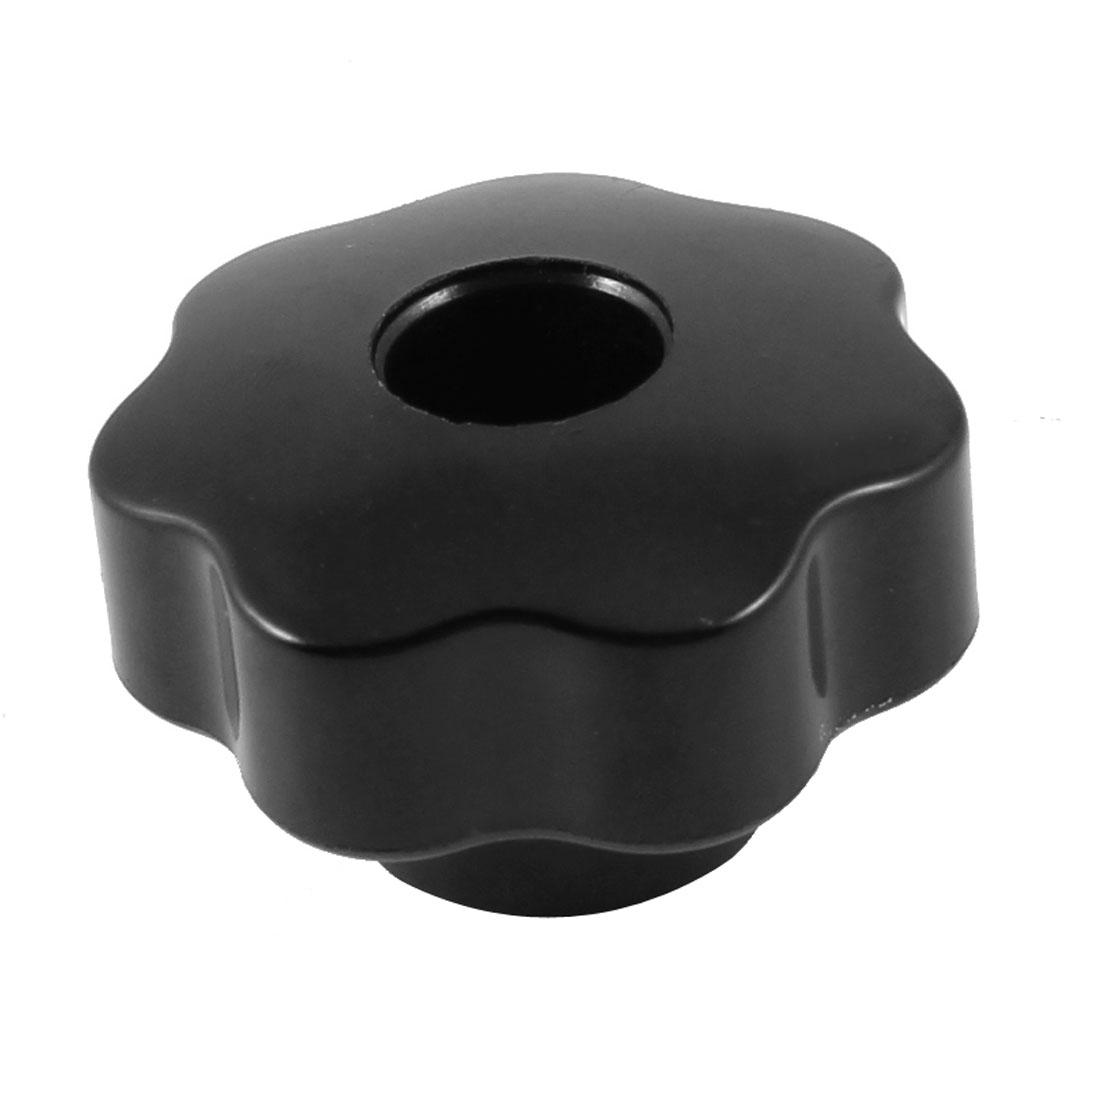 Black Plastic 7mm Female Thread 38mm Diameter Star Clamping Screw Knob